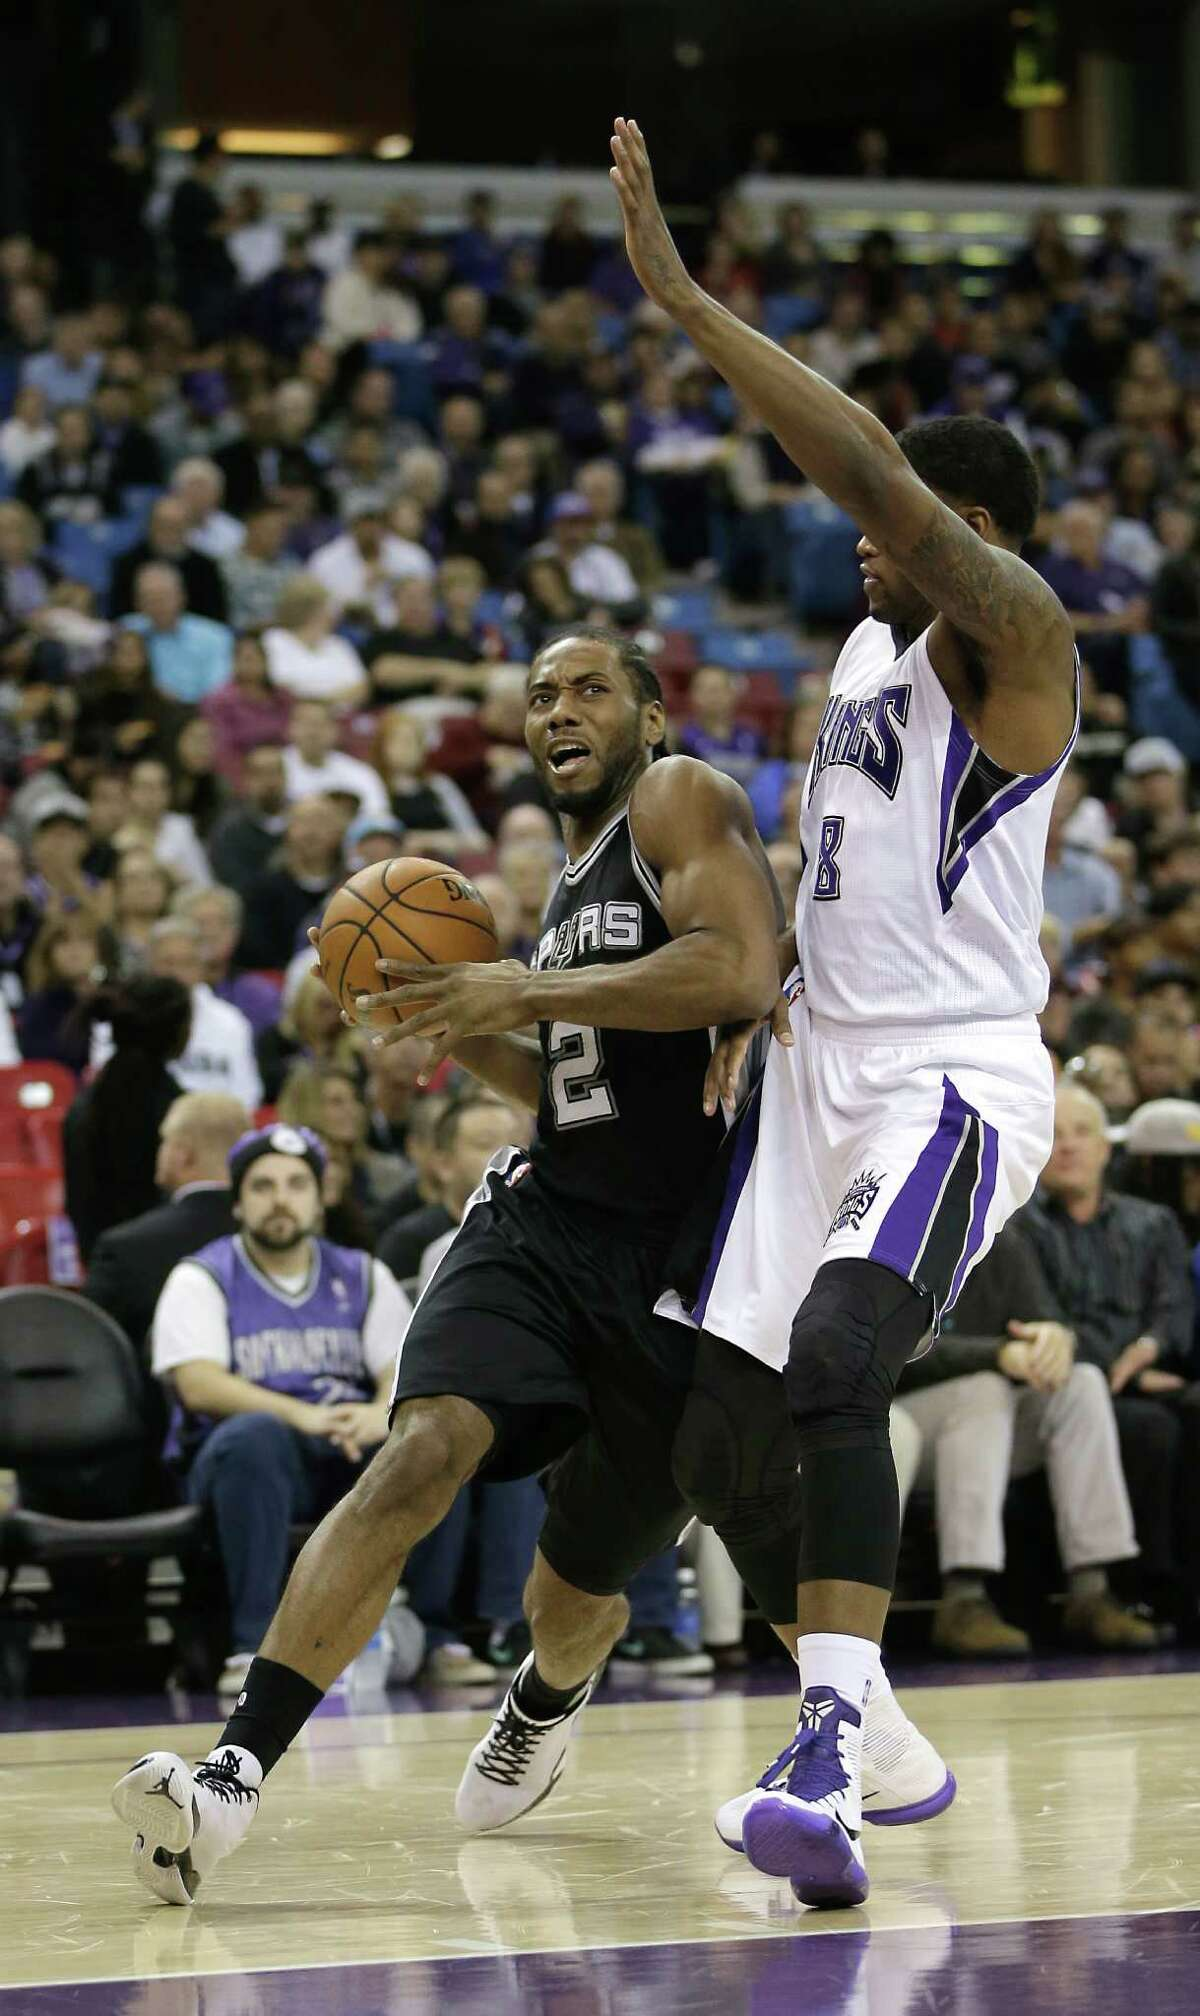 San Antonio Spurs forward Kawhi Leonard, left, drives against Sacramento Kings forward Rudy Gay during the first half of an NBA basketball game in Sacramento, Calif., Monday, Nov. 9, 2015. (AP Photo/Rich Pedroncelli)